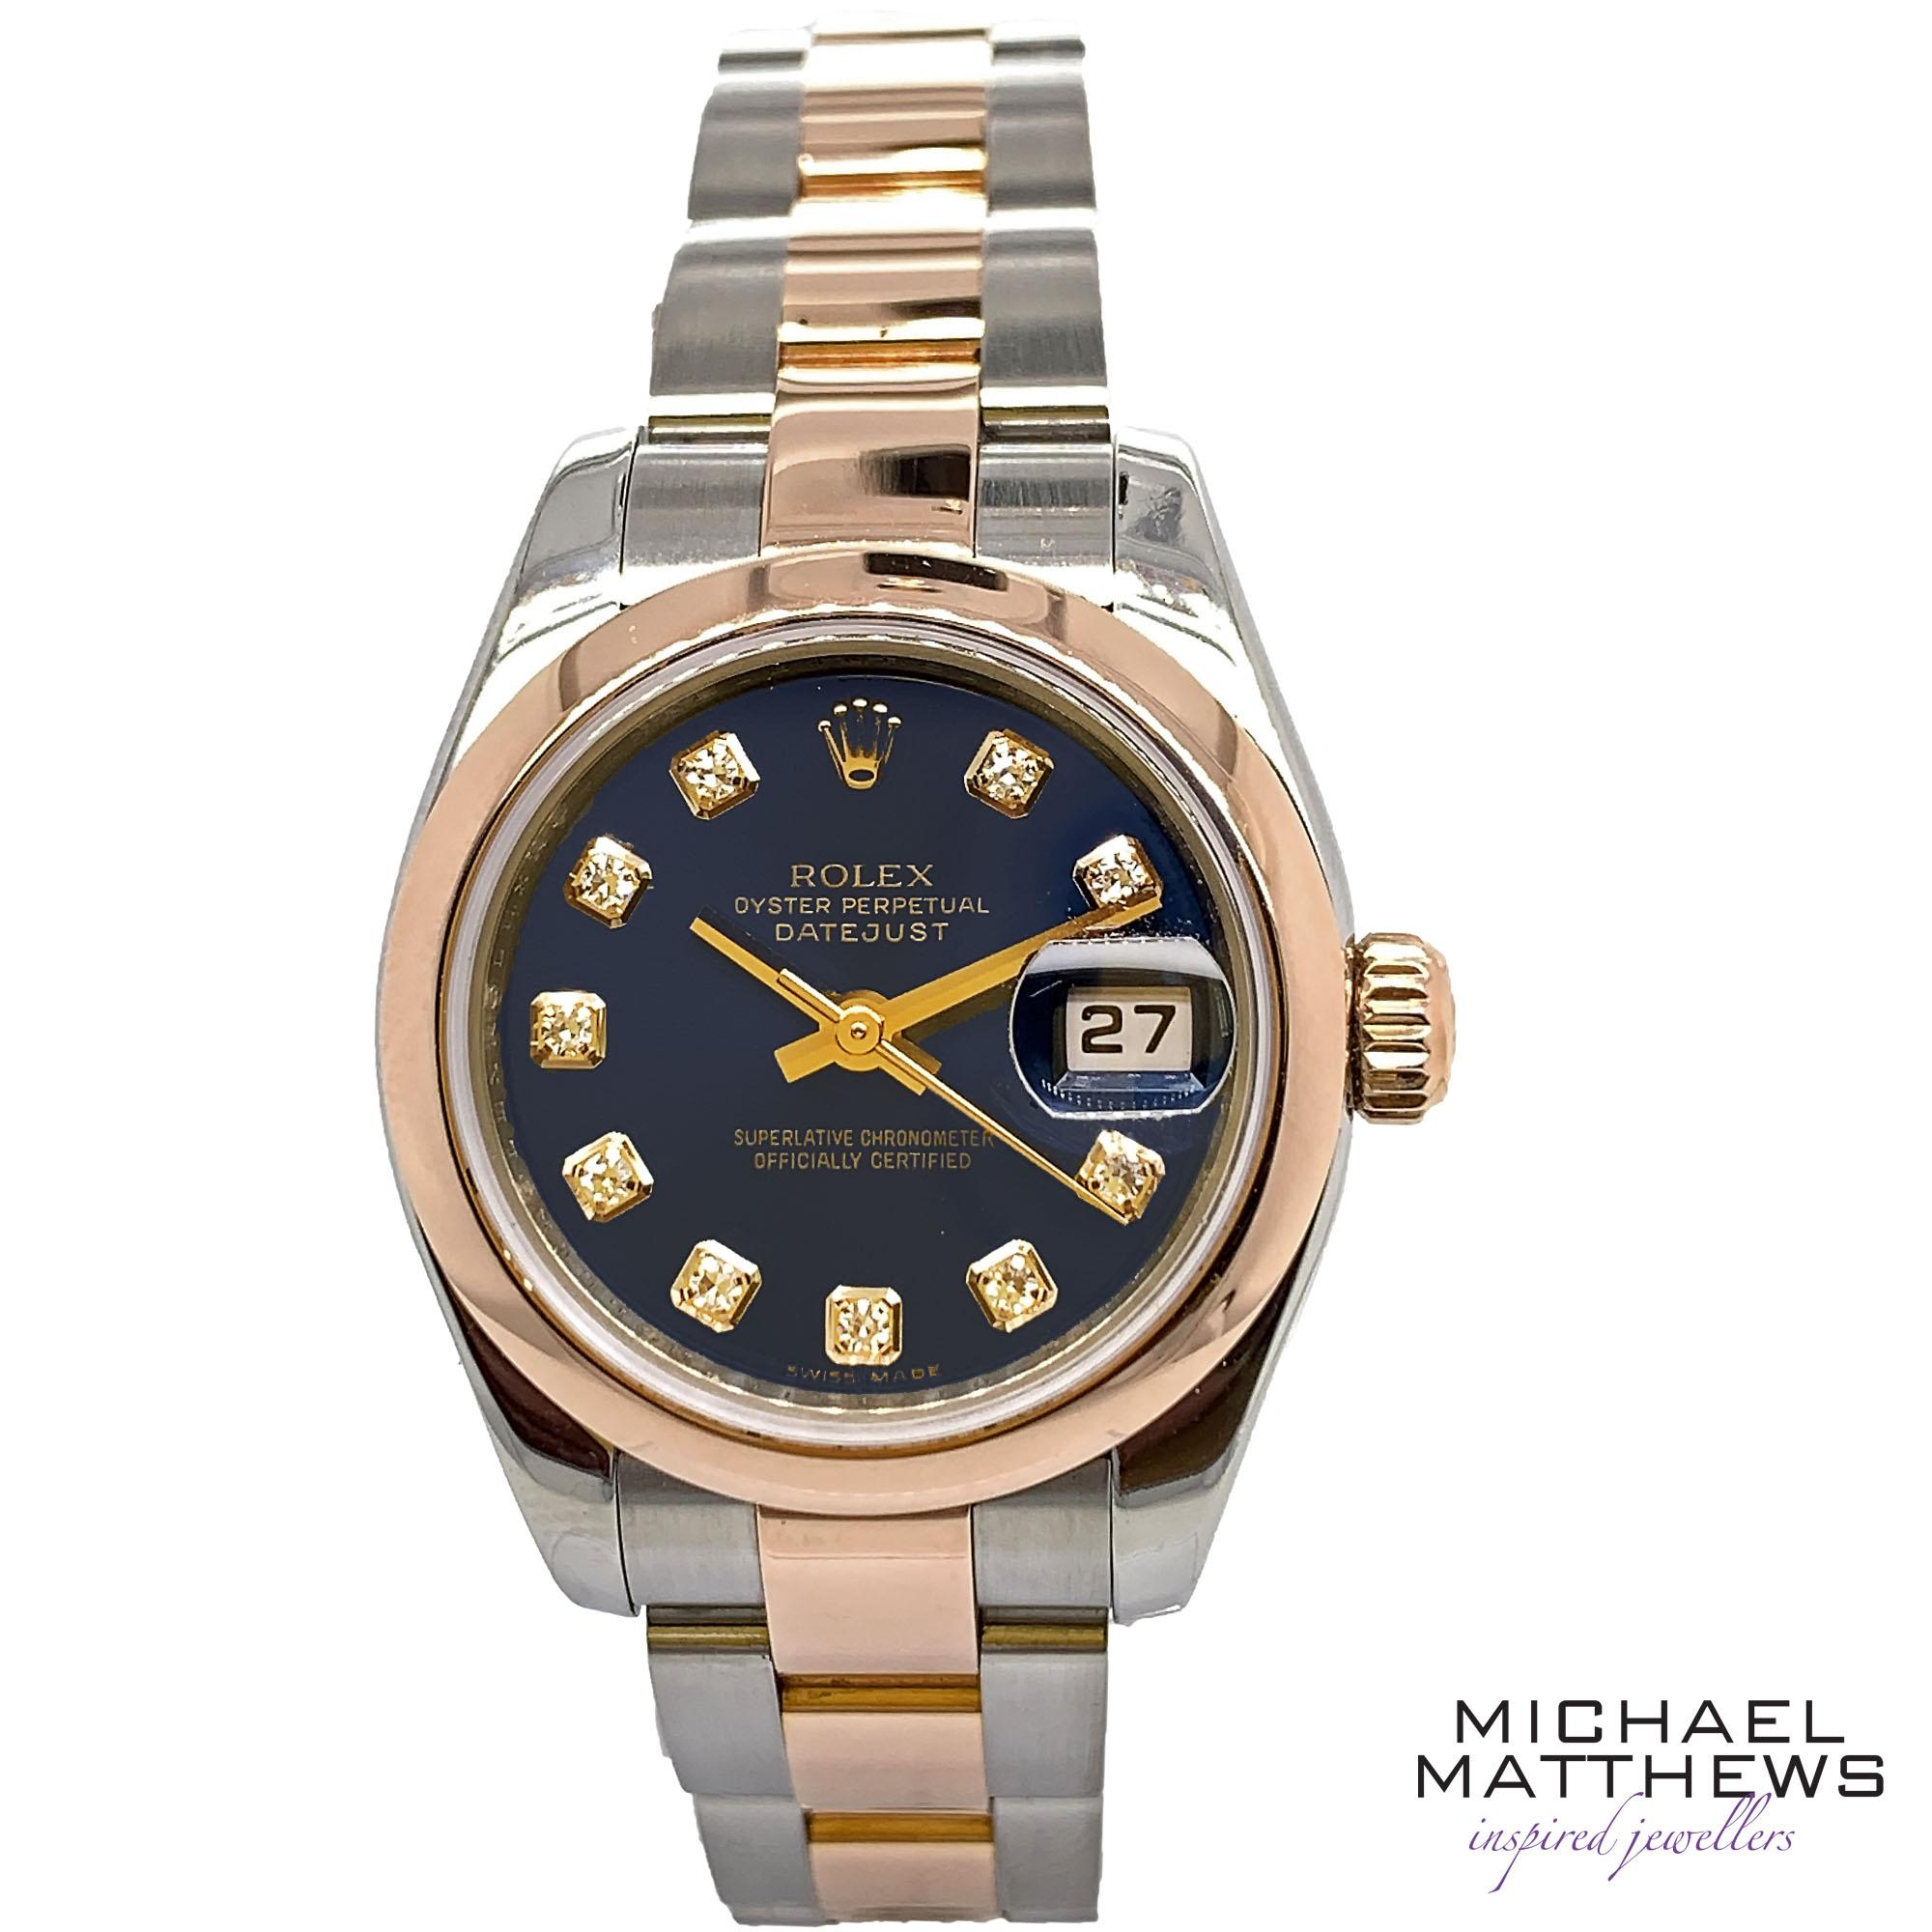 Rolex Datejust 26mm Watch Michael Matthews Jewellery Bournemouth Fareham Jewellers